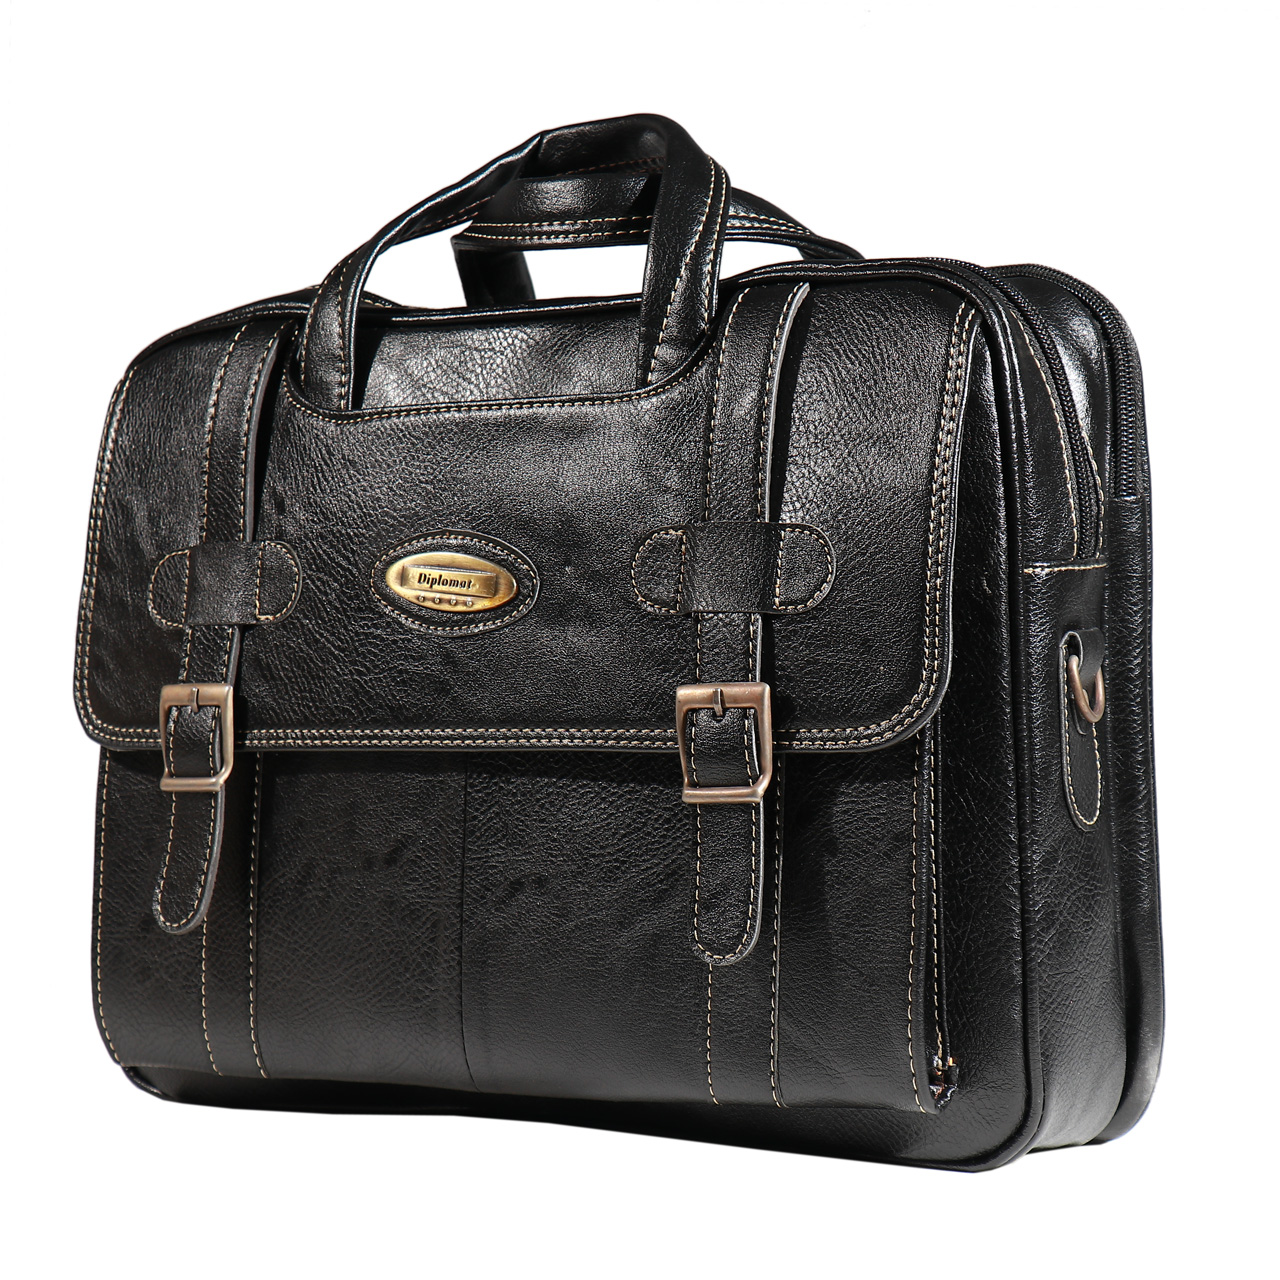 کیف اداری چرم مصنوعی دیپلمات مدل F8594